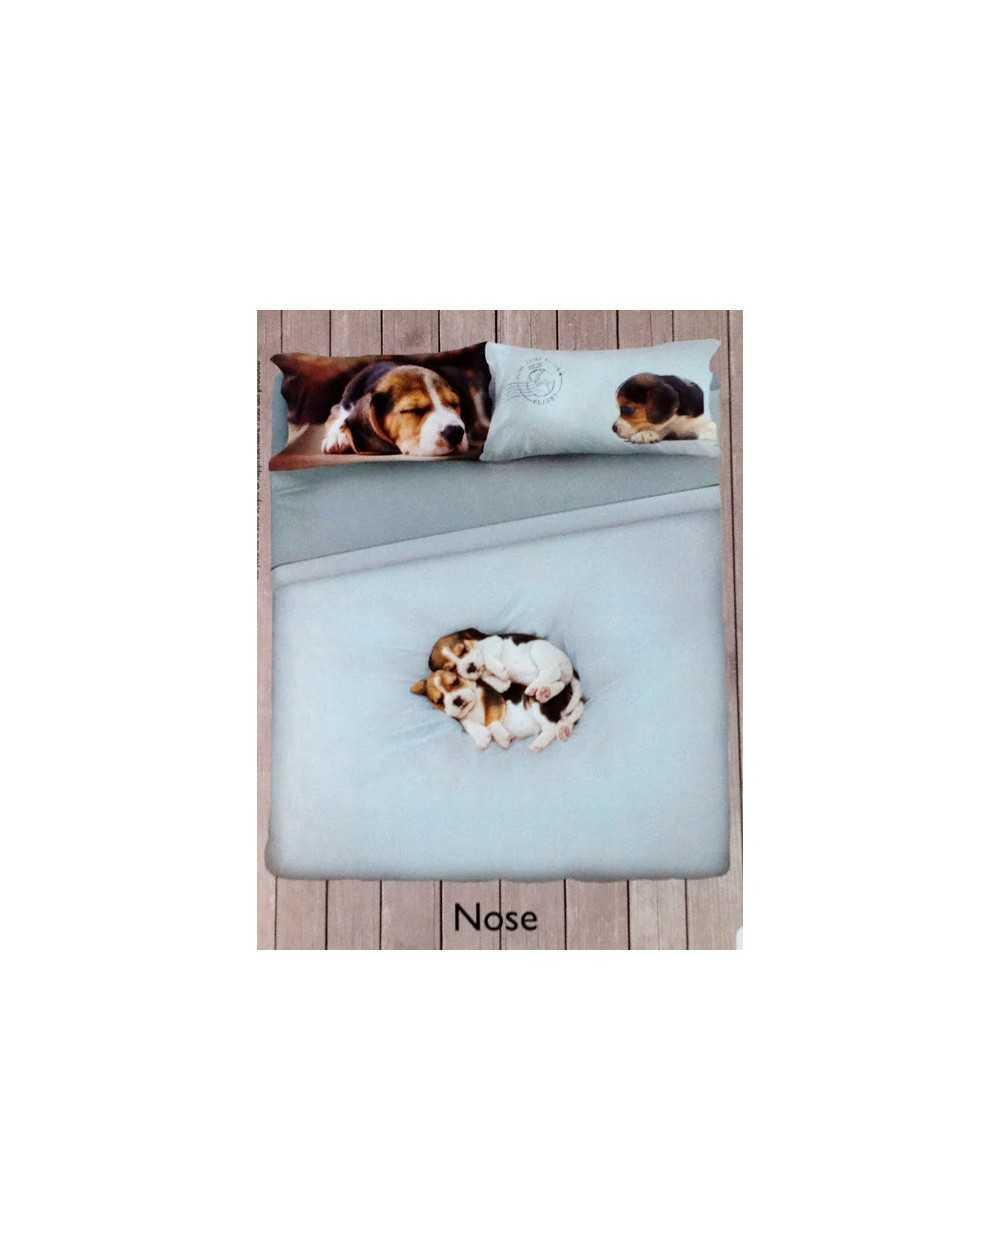 Lenzuola Matrimoniali Con Cani.Set Lenzuola Copriletto Matrimoniale Planet Nose Cani Beagle Celeste Gabel